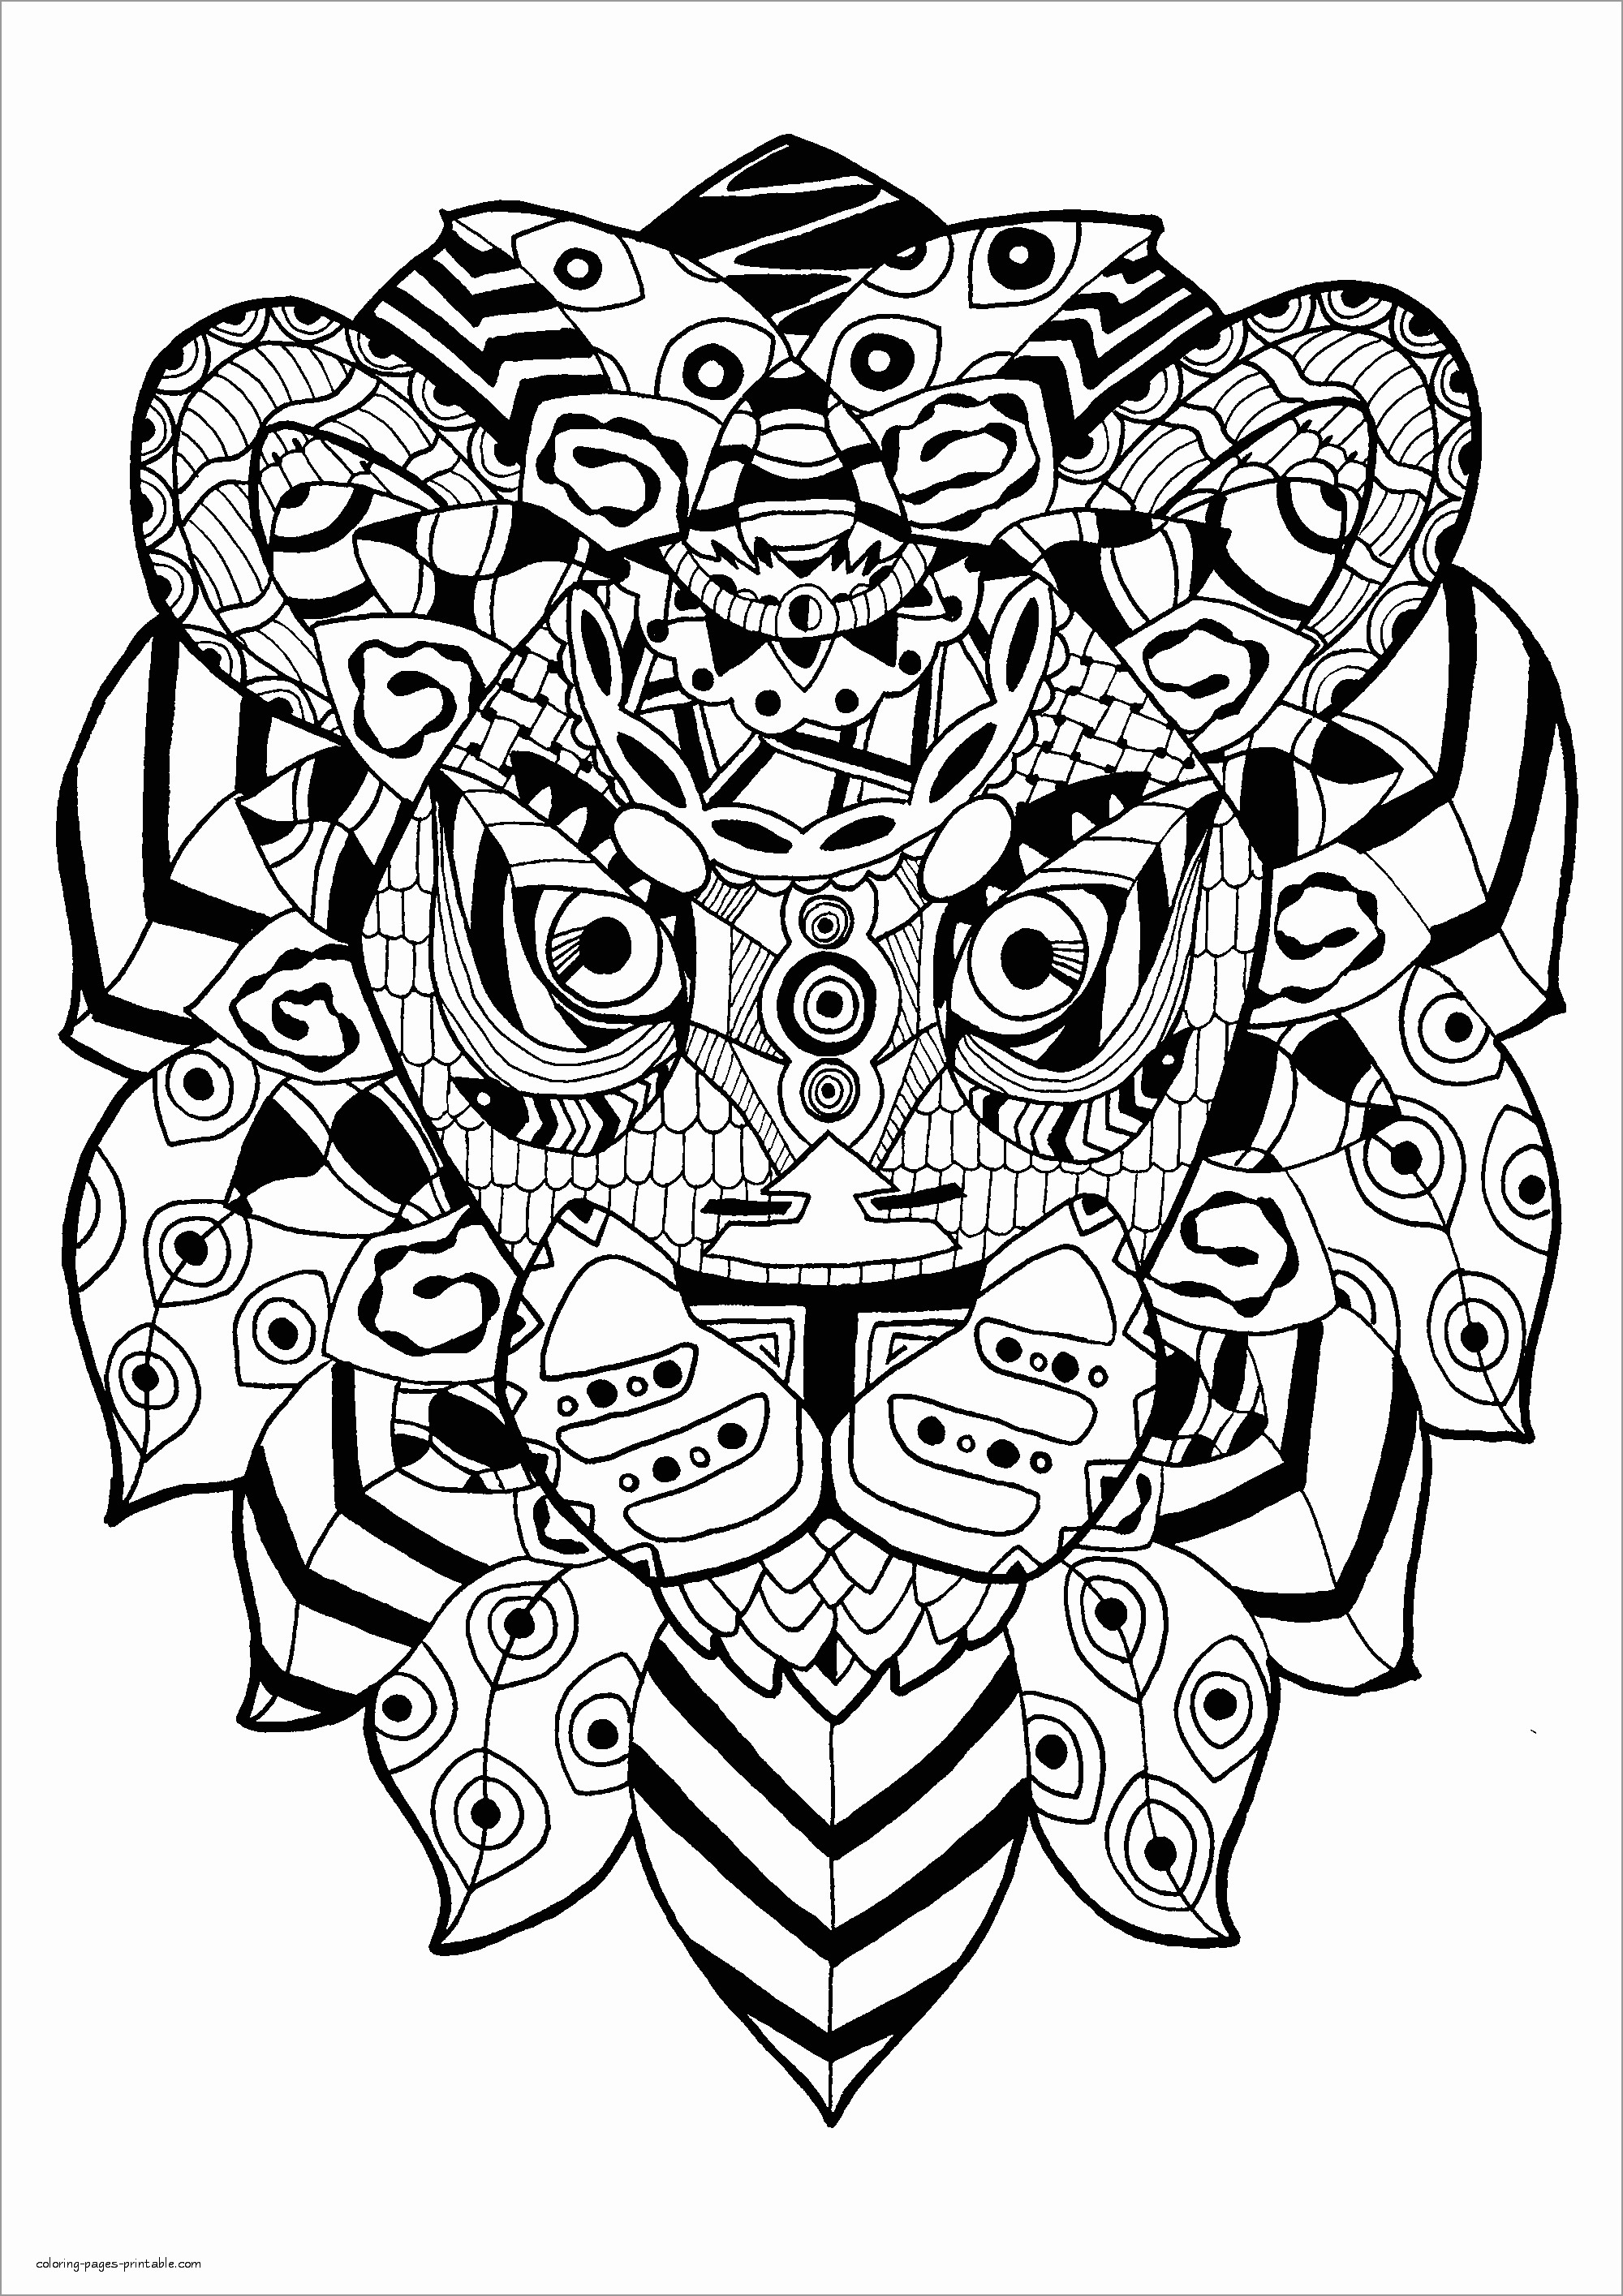 Mandala Lion Head Coloring Page